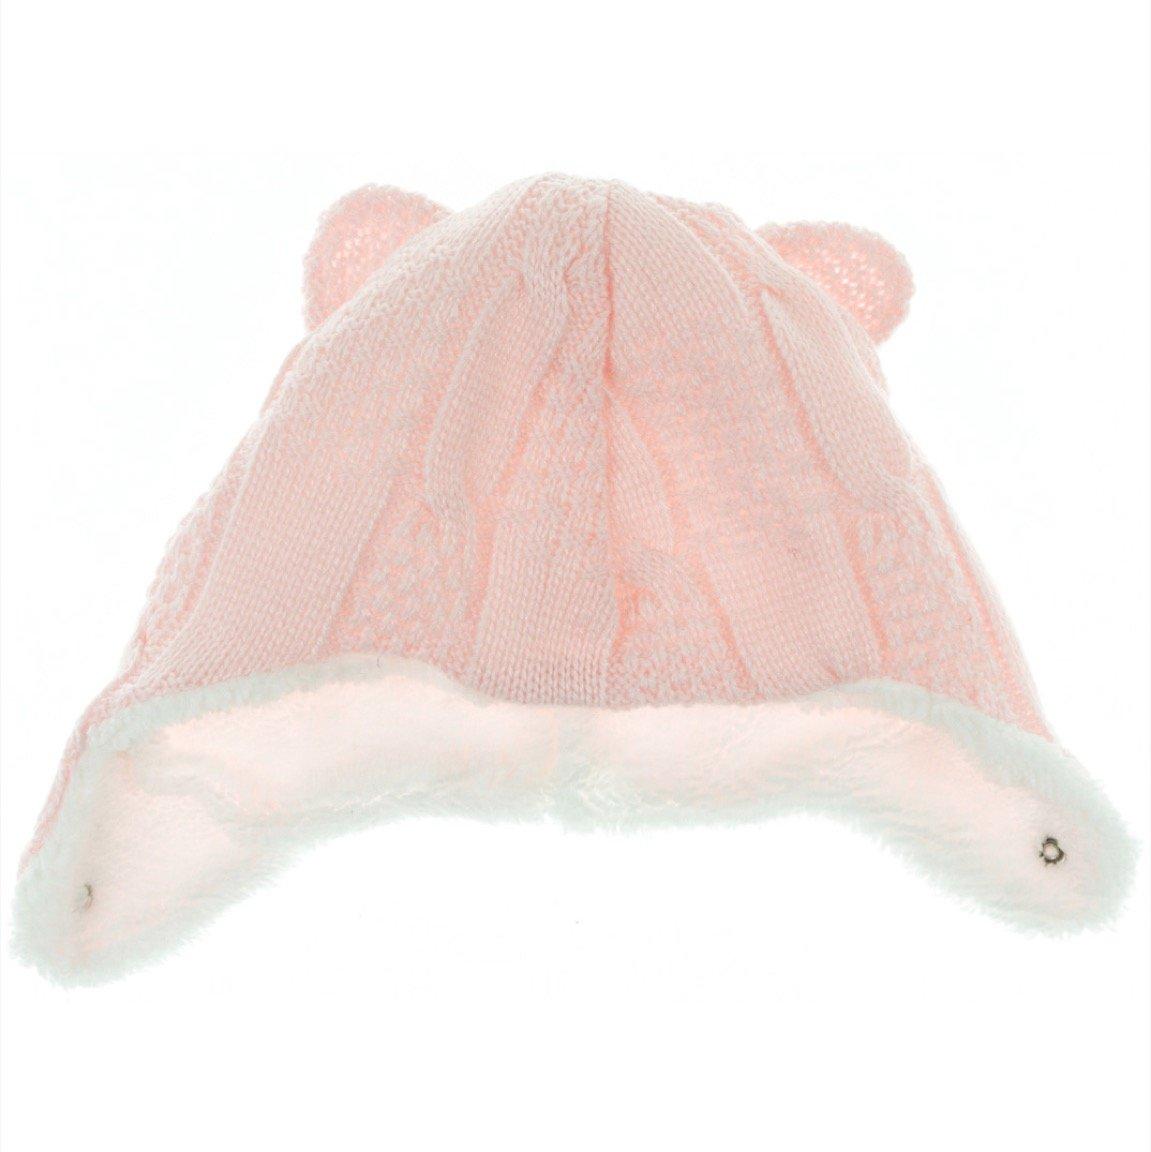 AZ πλεκτό βρεφικό σκουφί «Pink Knit»